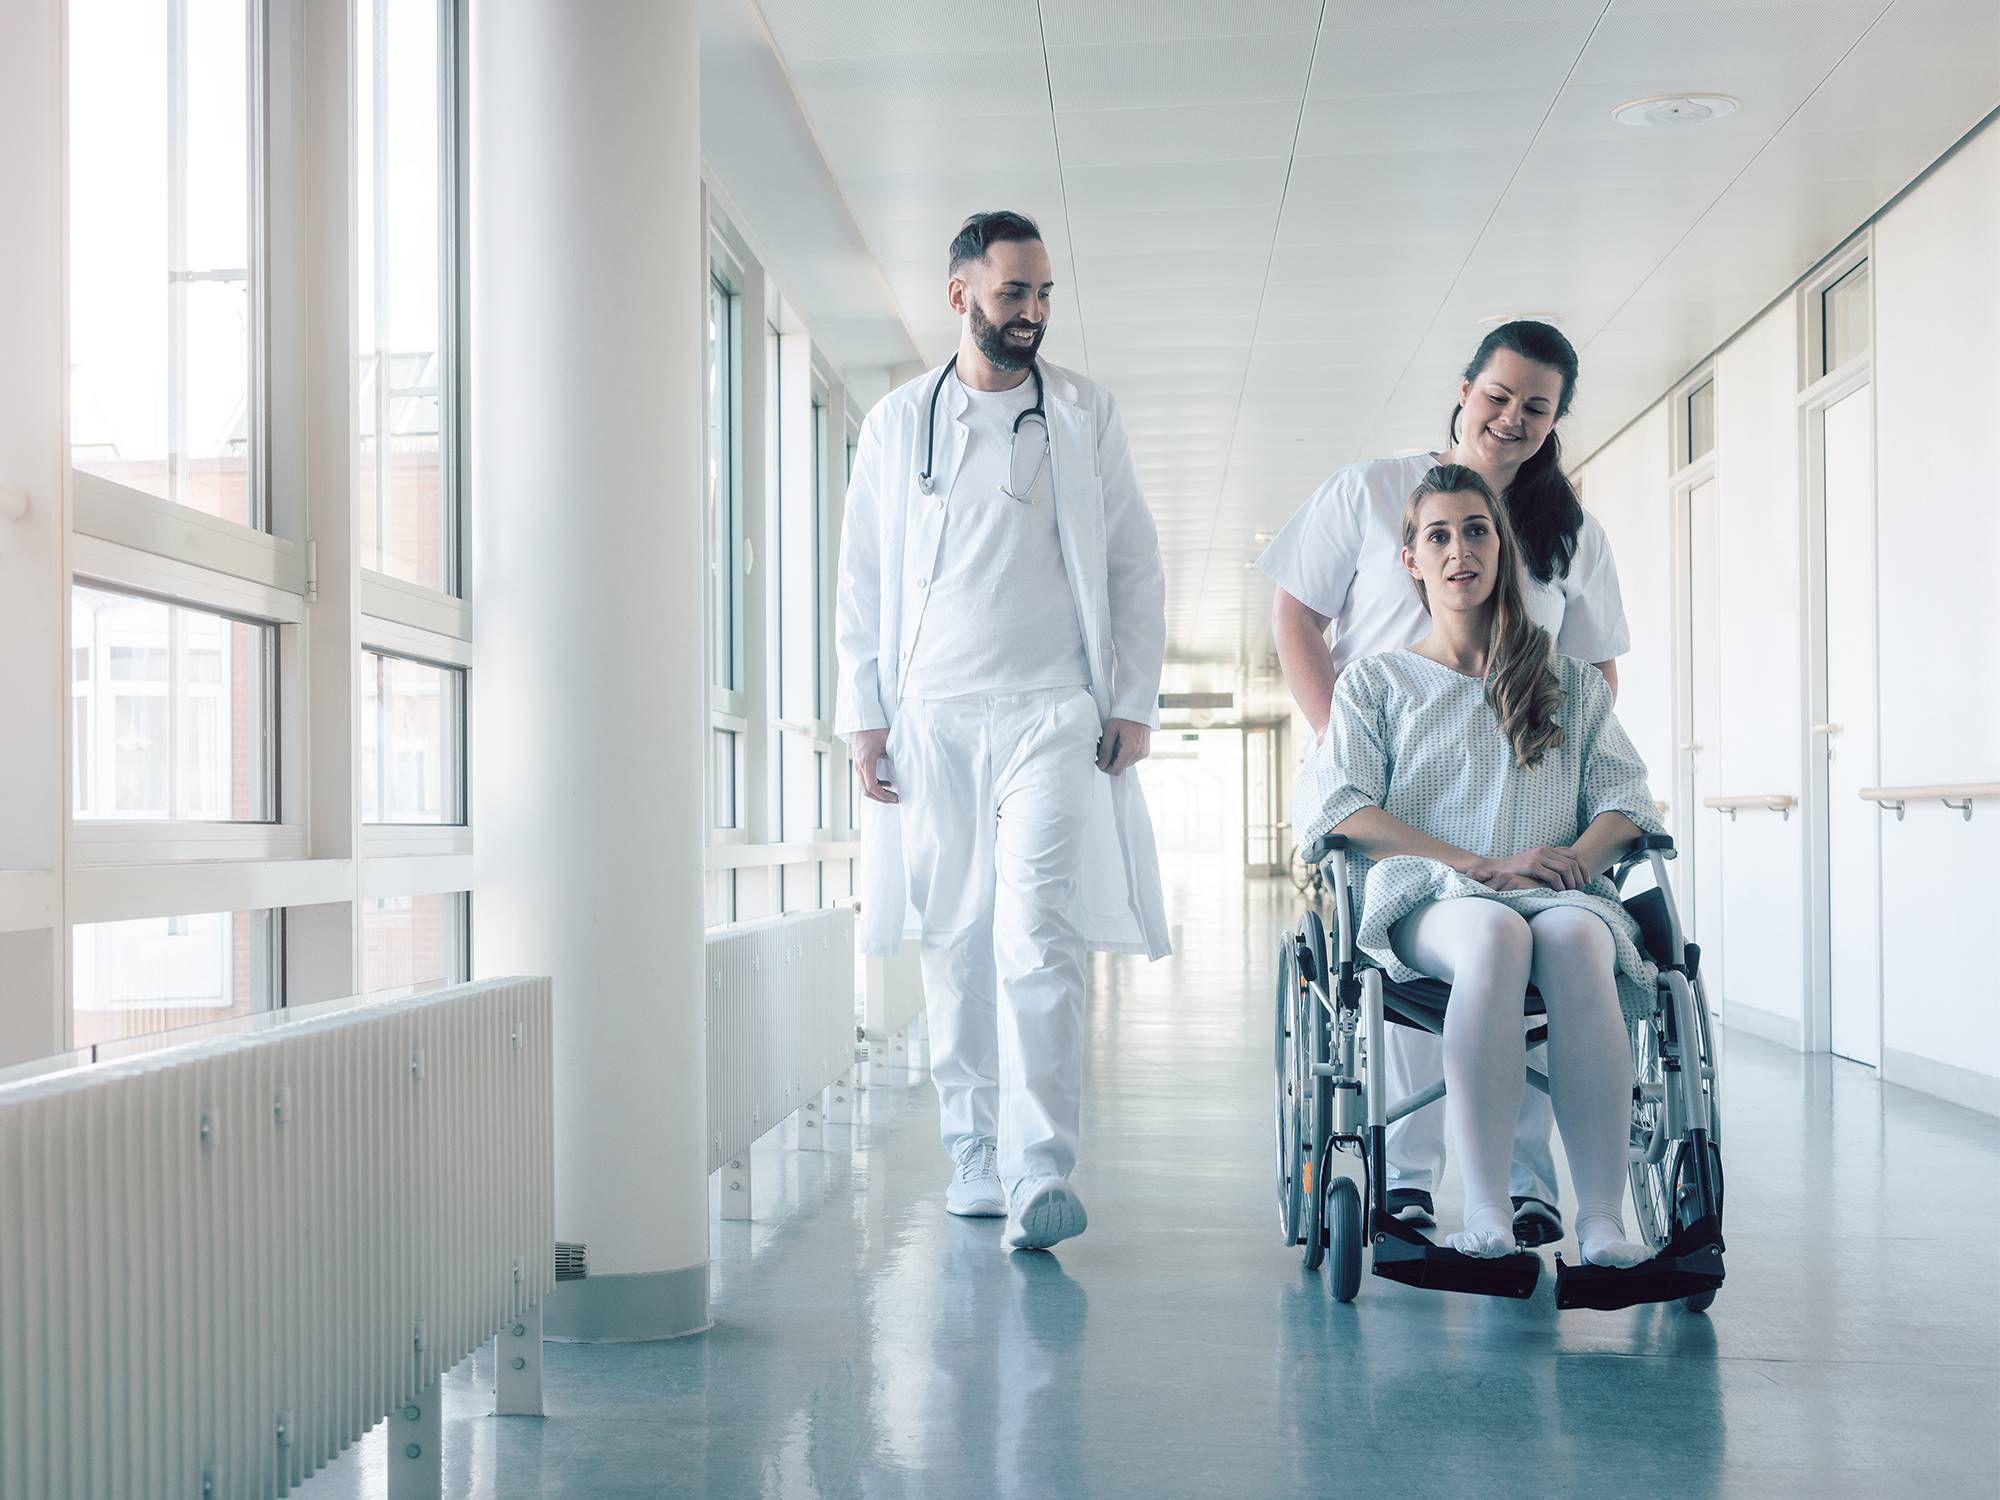 Temperature monitoring in hospitals